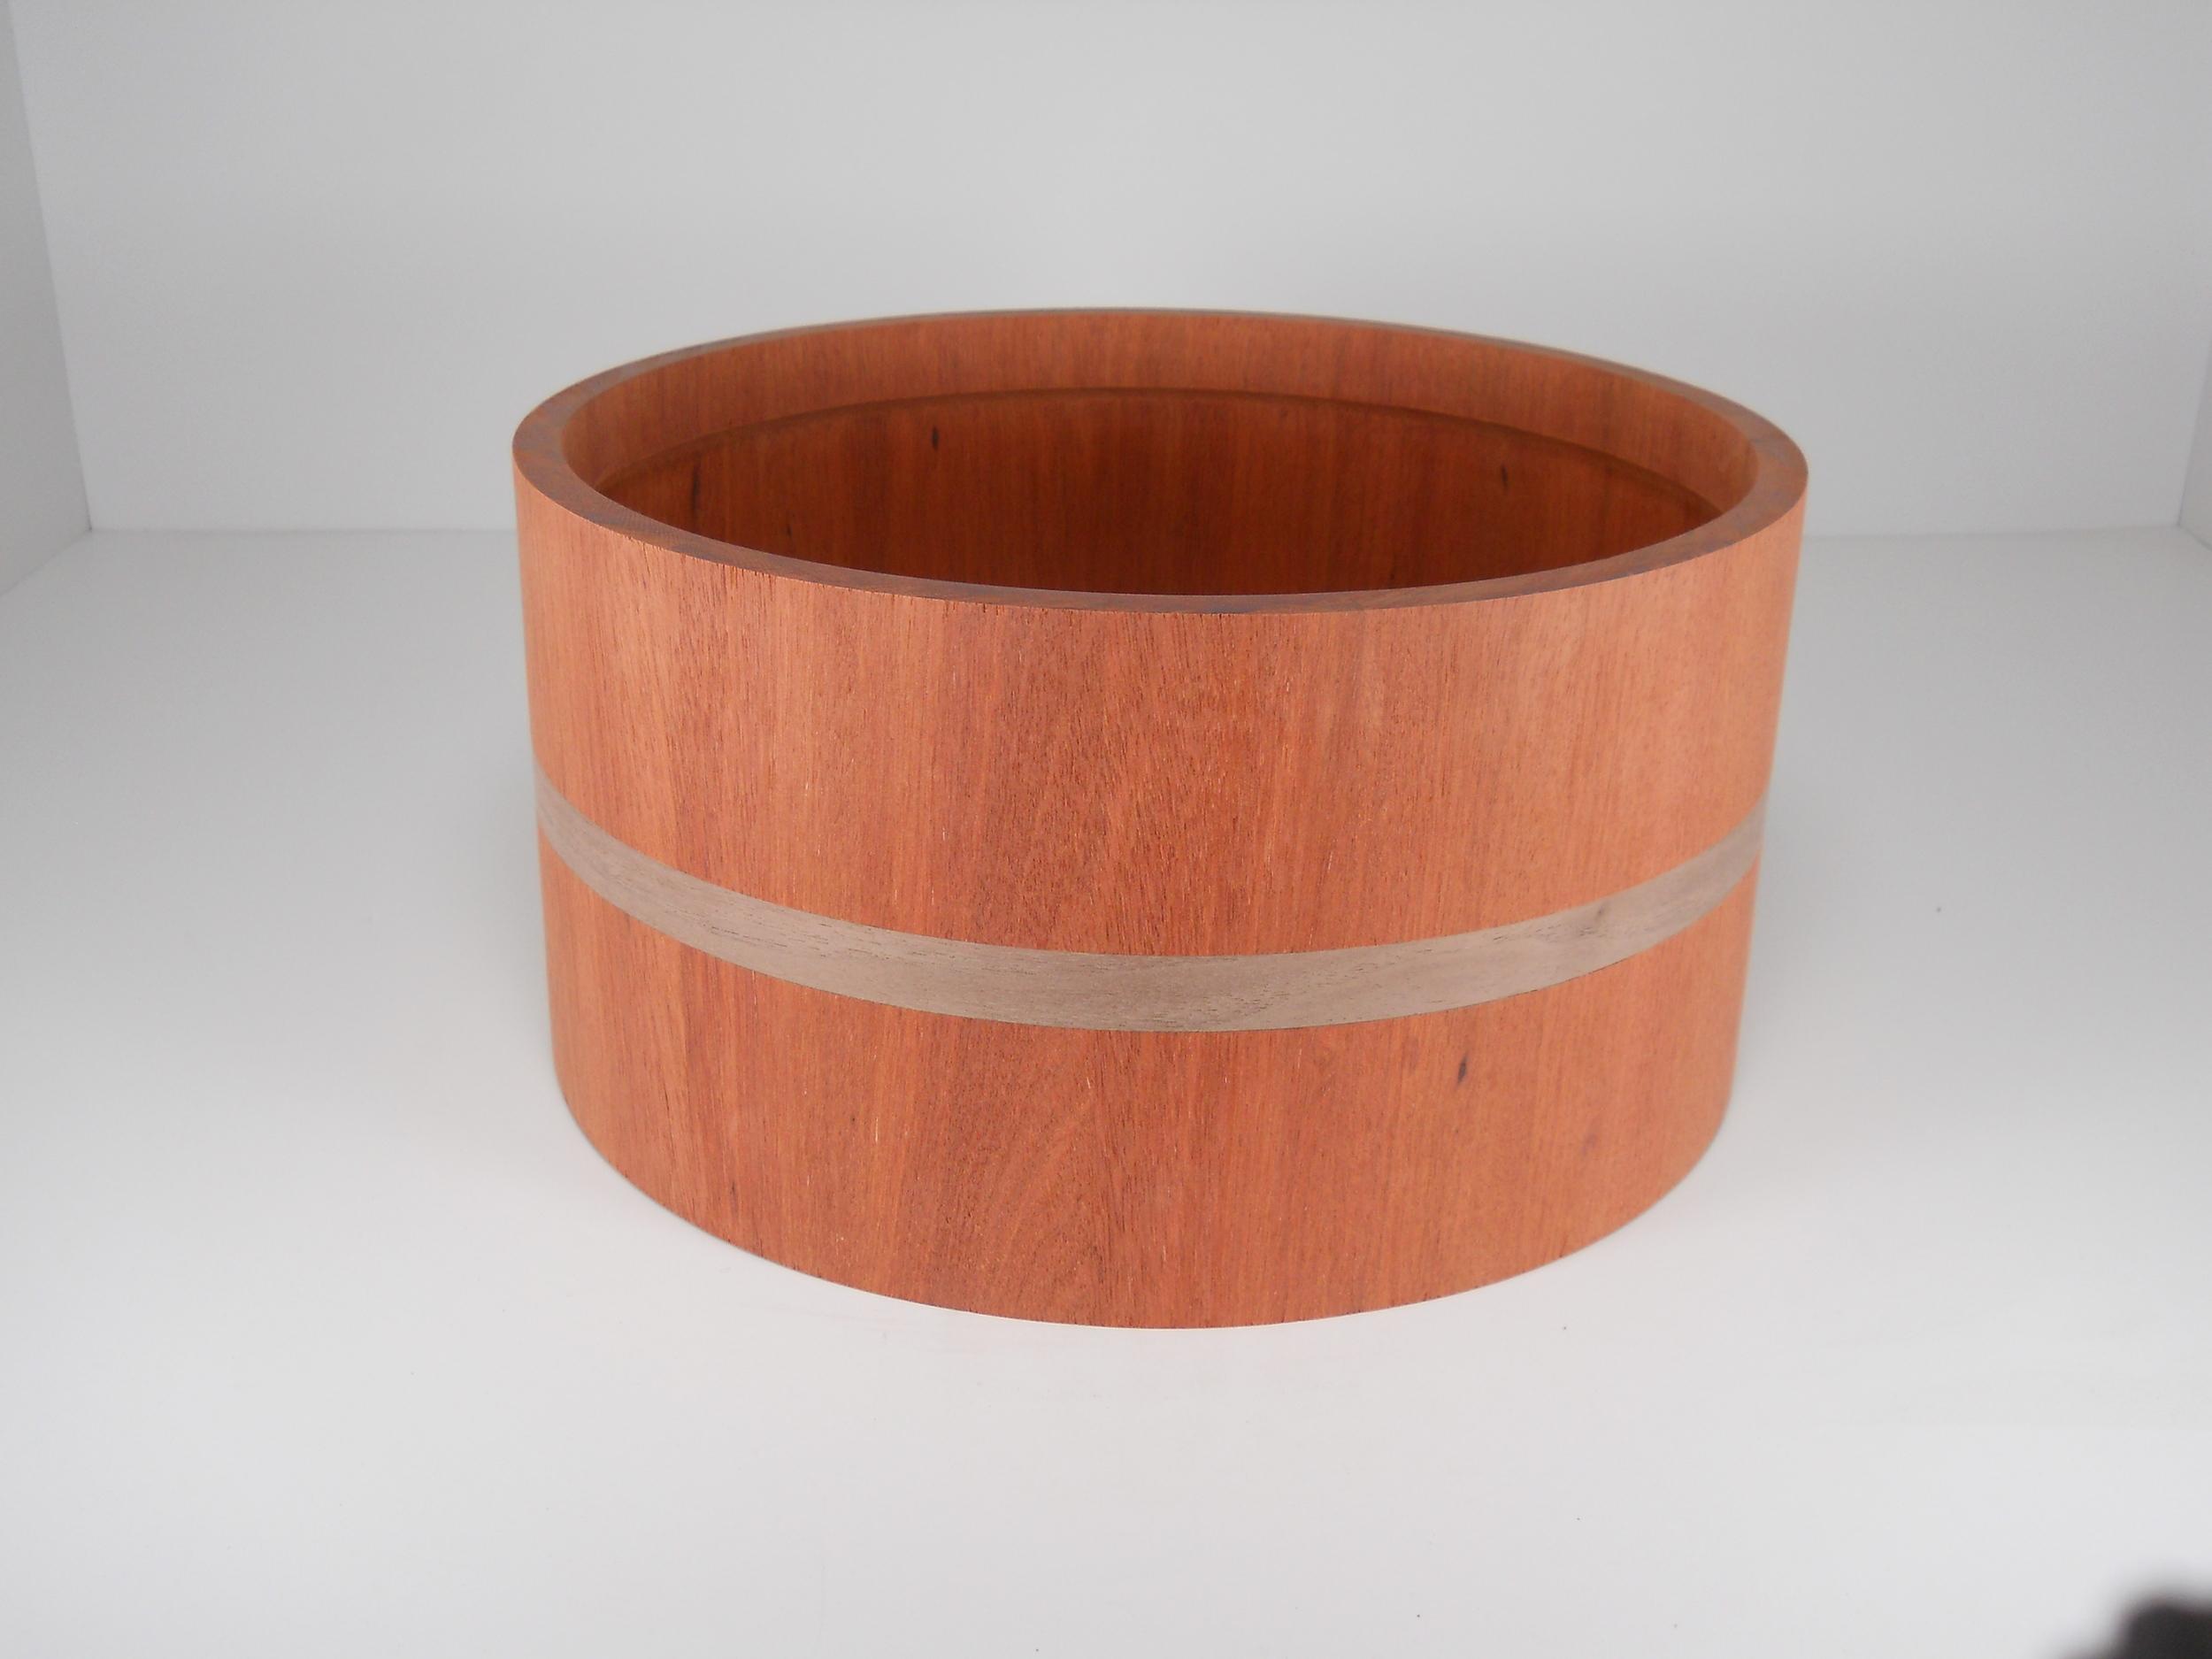 Bloodwood with walnut inlay